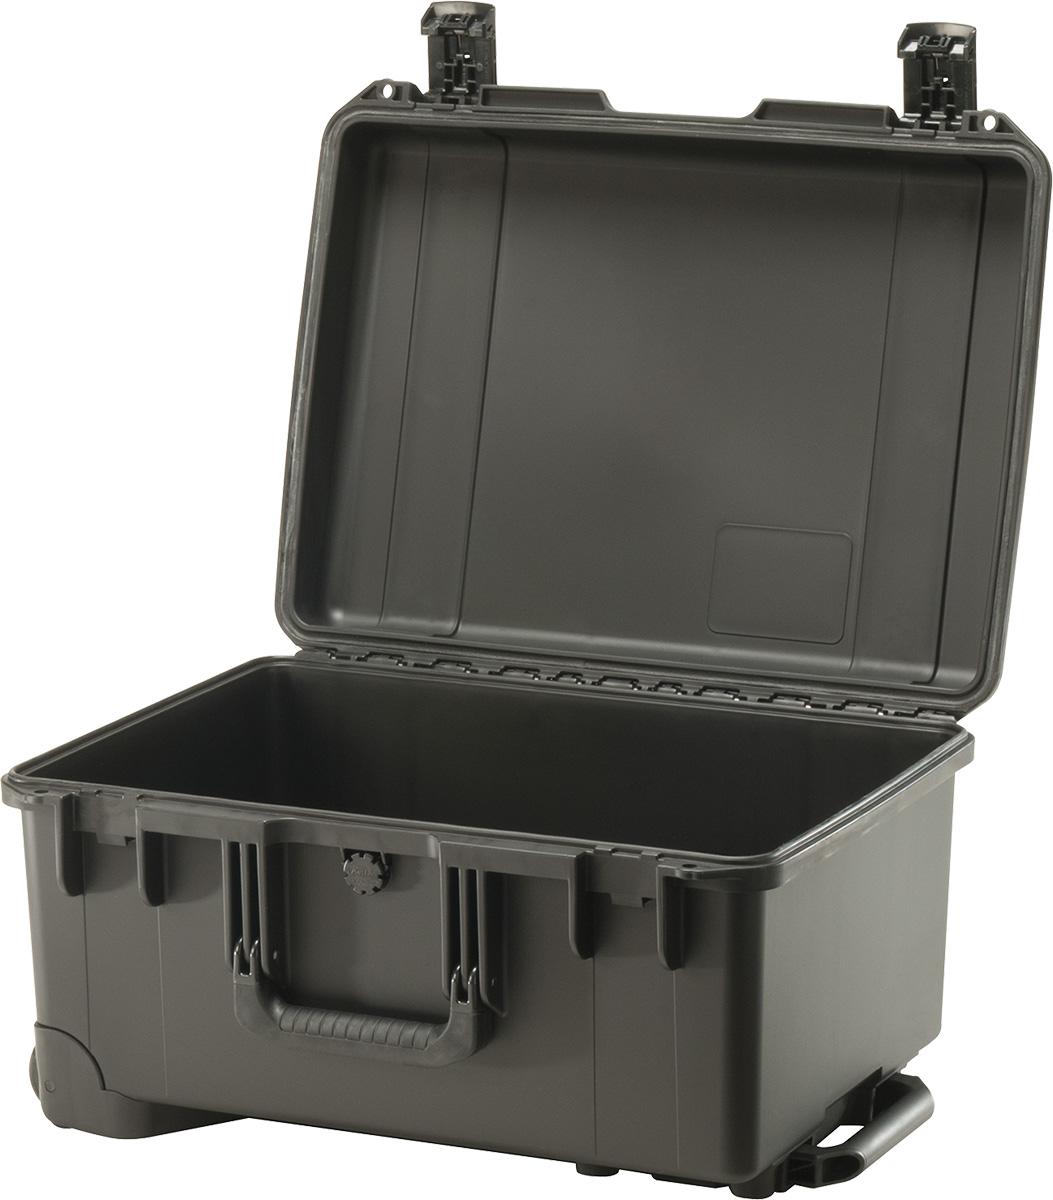 pelican peli im2620 drone case hardcase